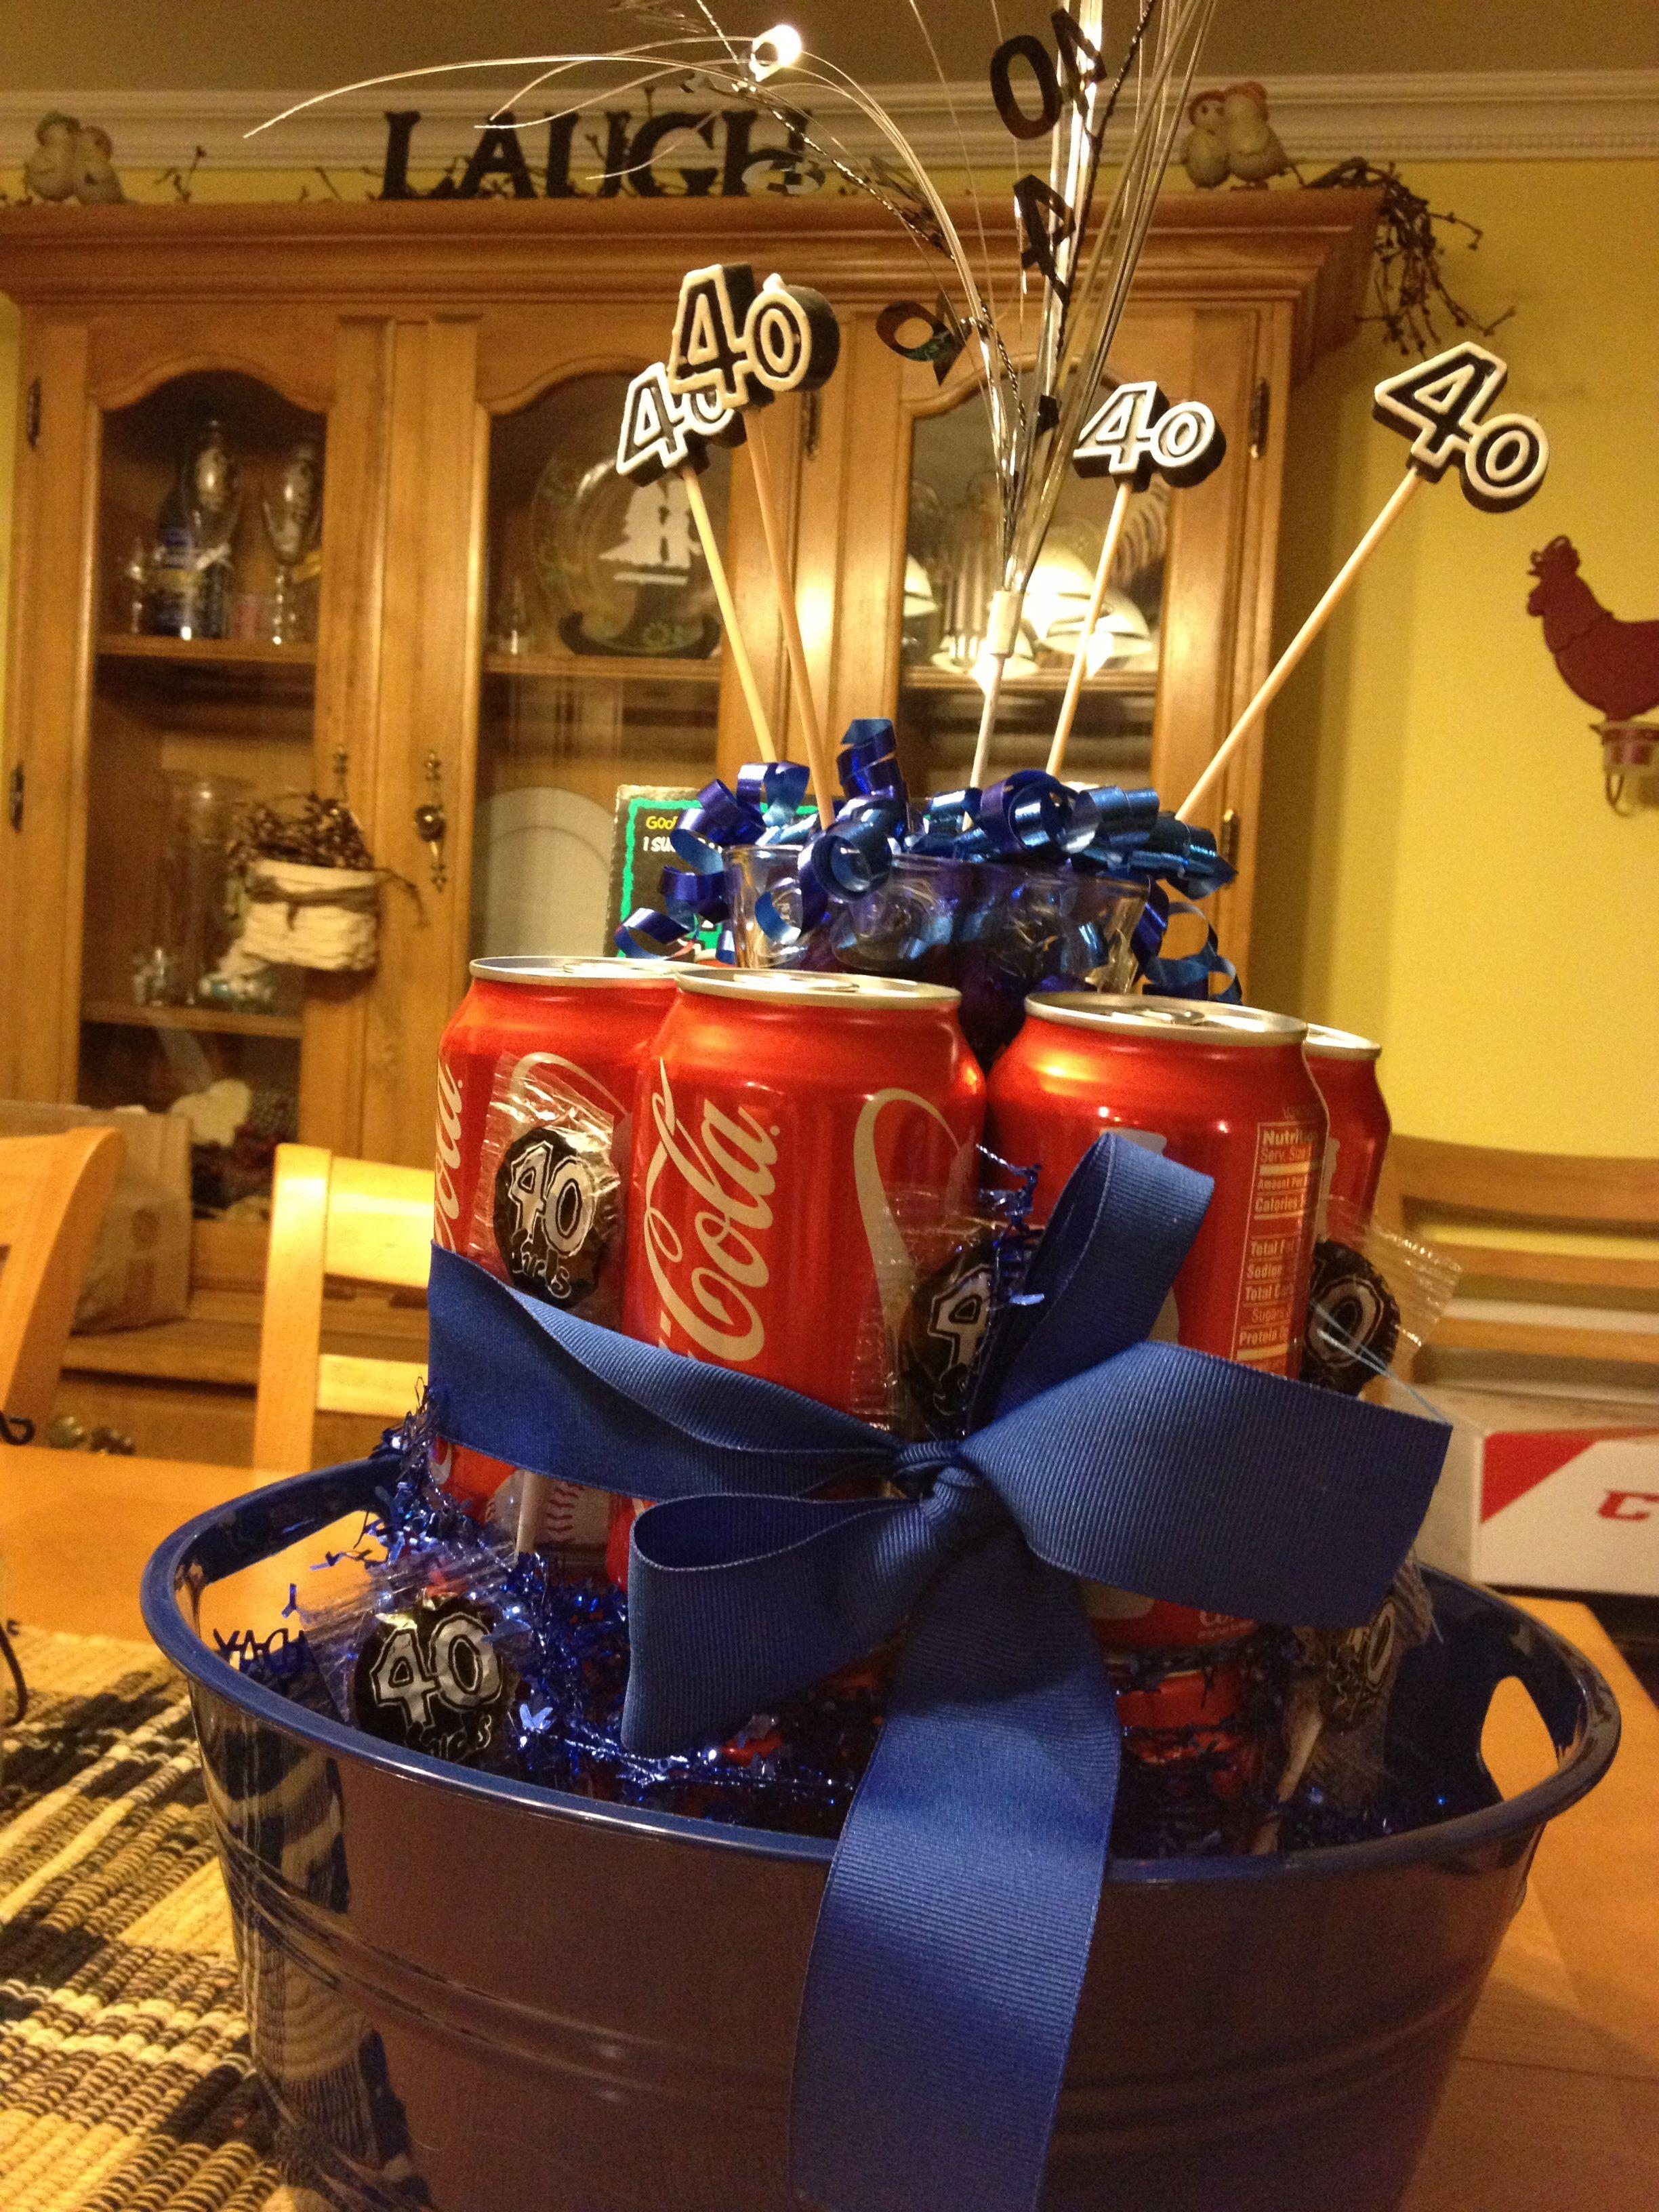 40th birthday gift 40th birthday gifts 40th birthday